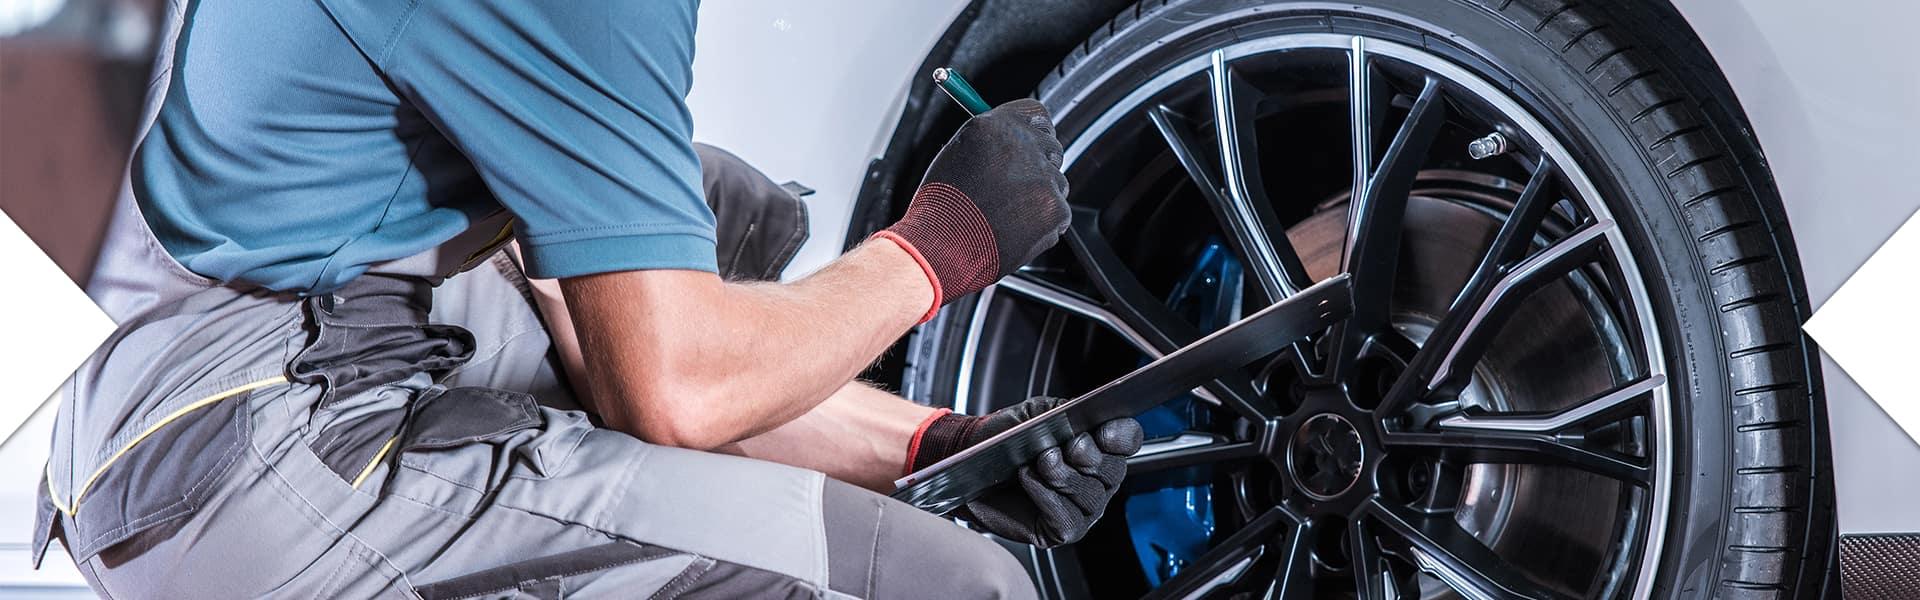 Washington Hyundai is a Hyundai Dealership in Washington near McMurray, PA   Service Advisor Checking Tires on Vehicle